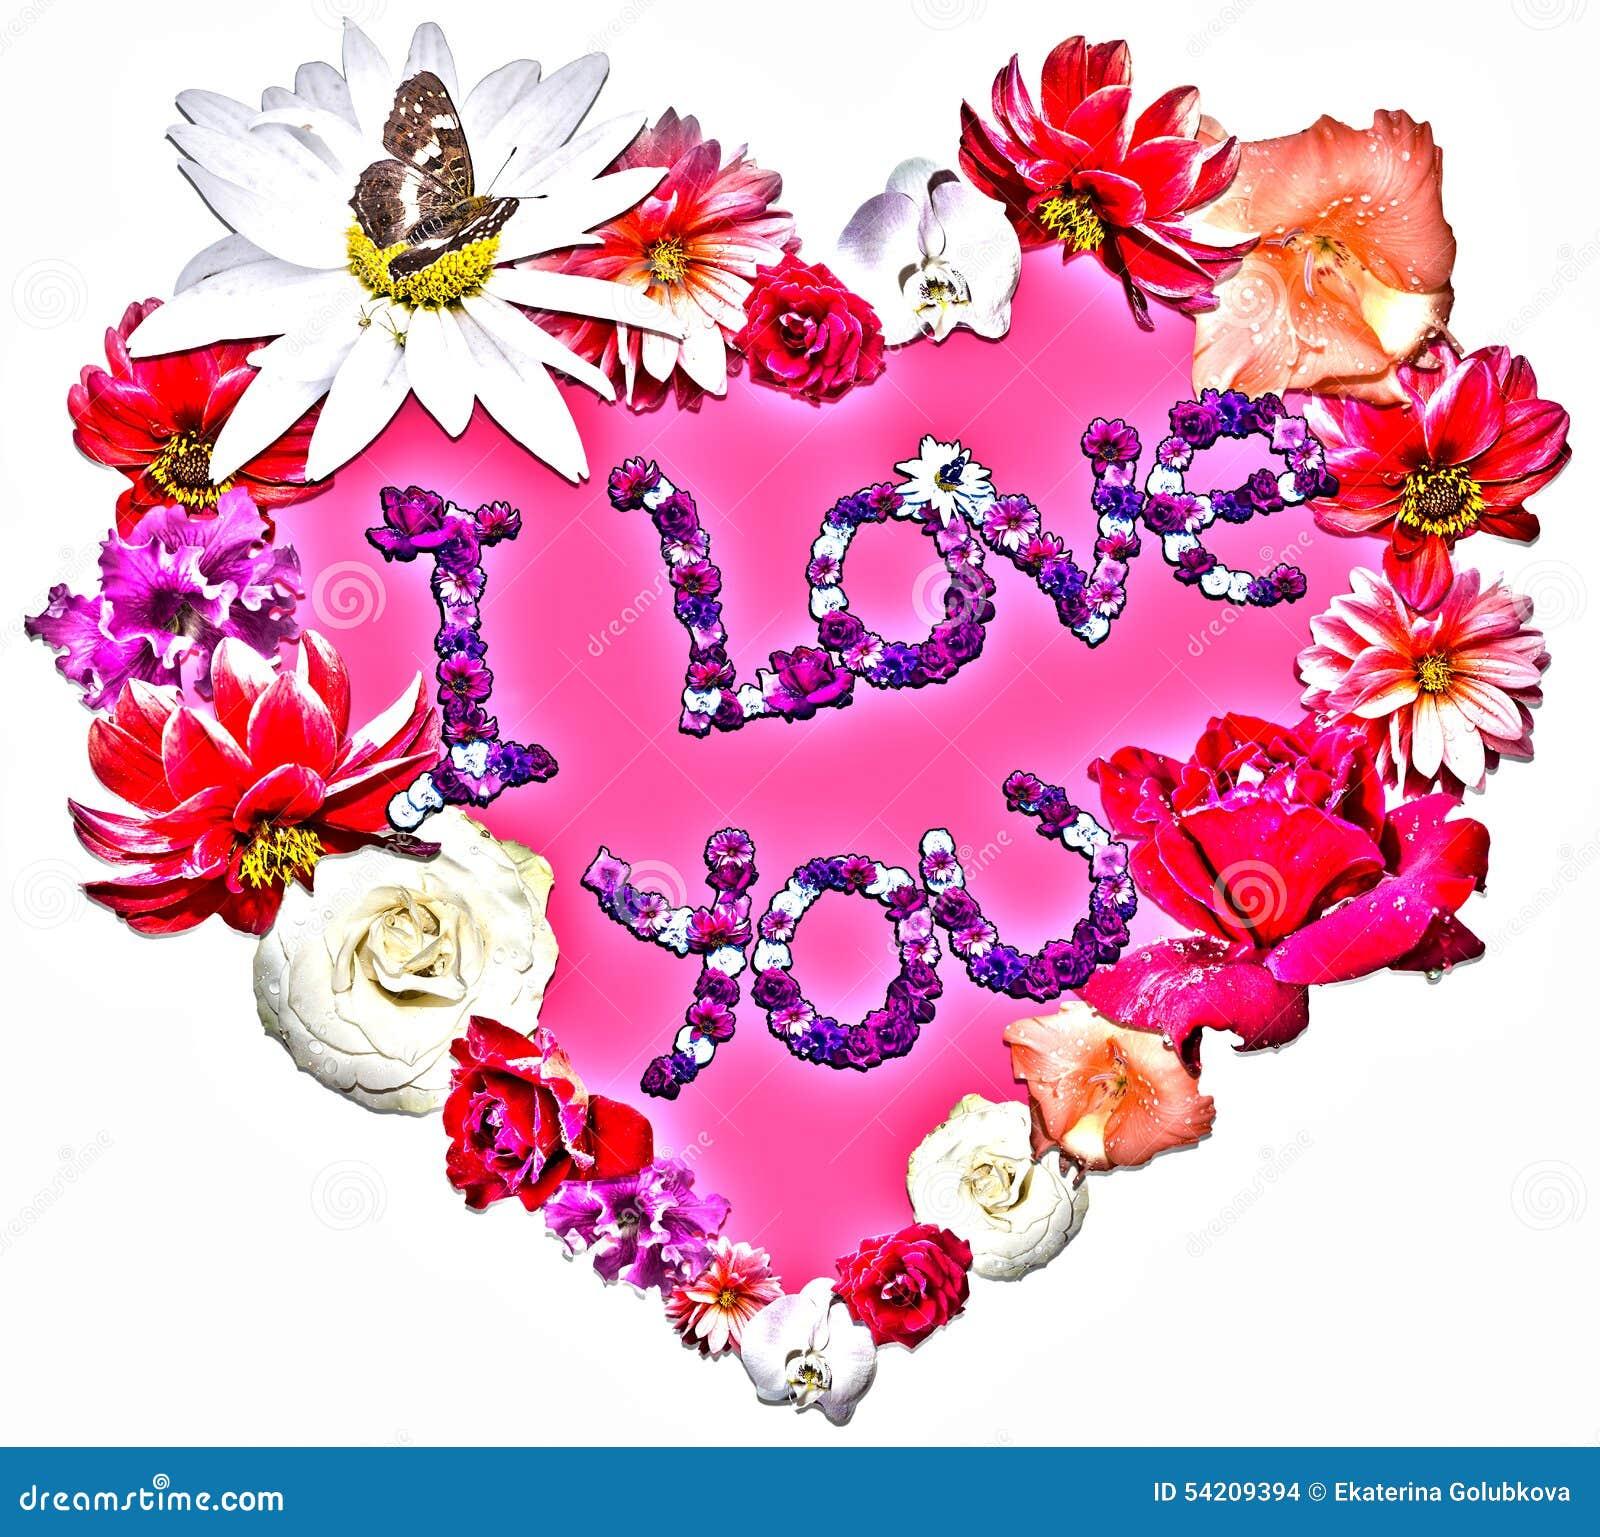 Love Symbols With Flowers Olivero